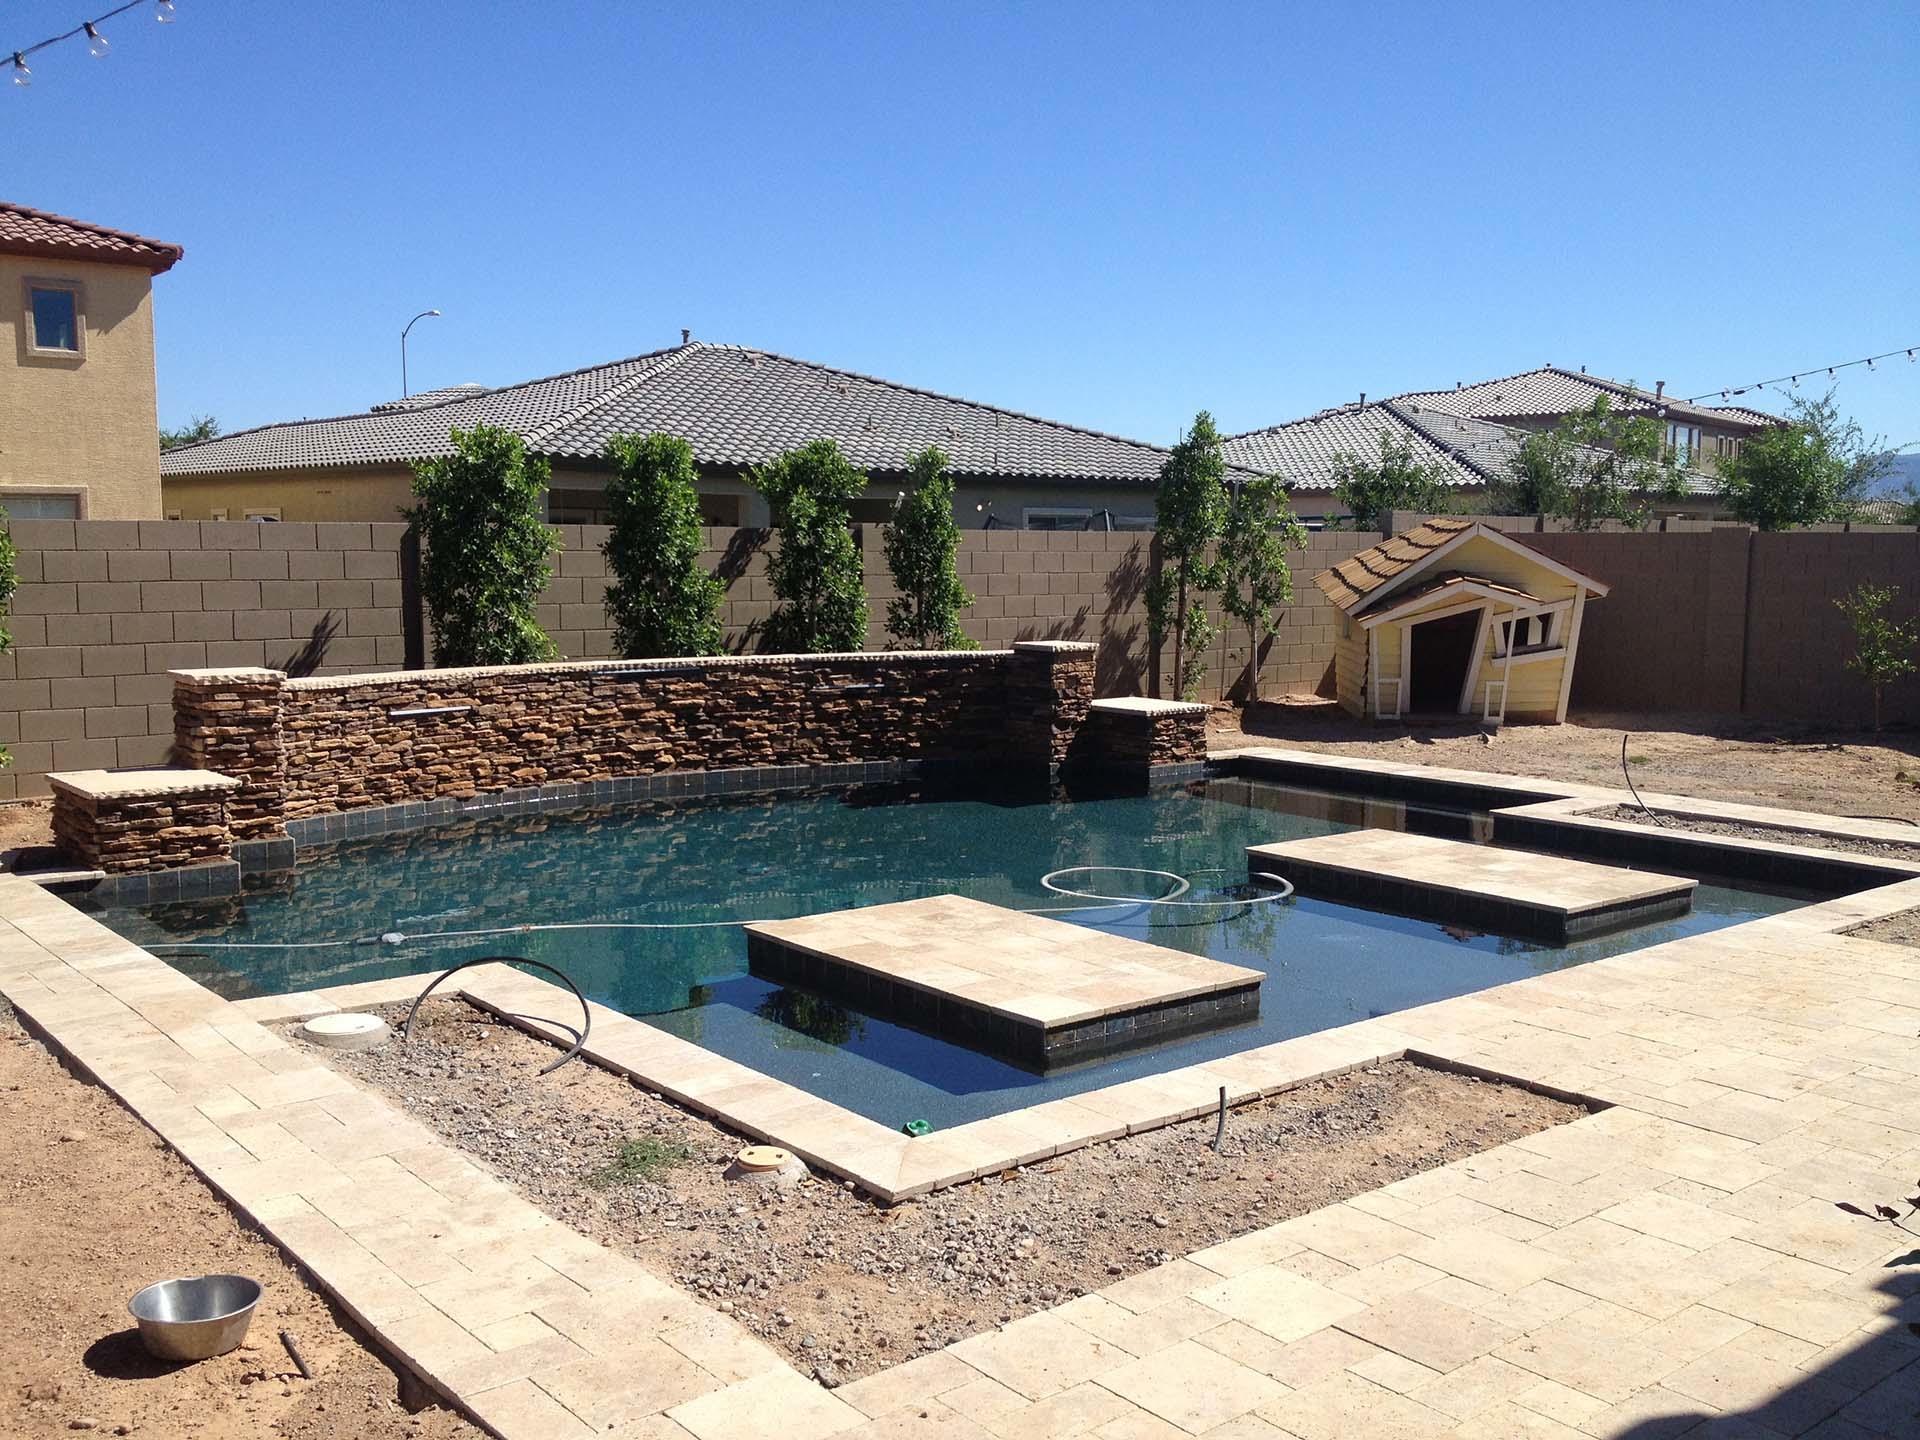 No Limit Pools & Spas image 54